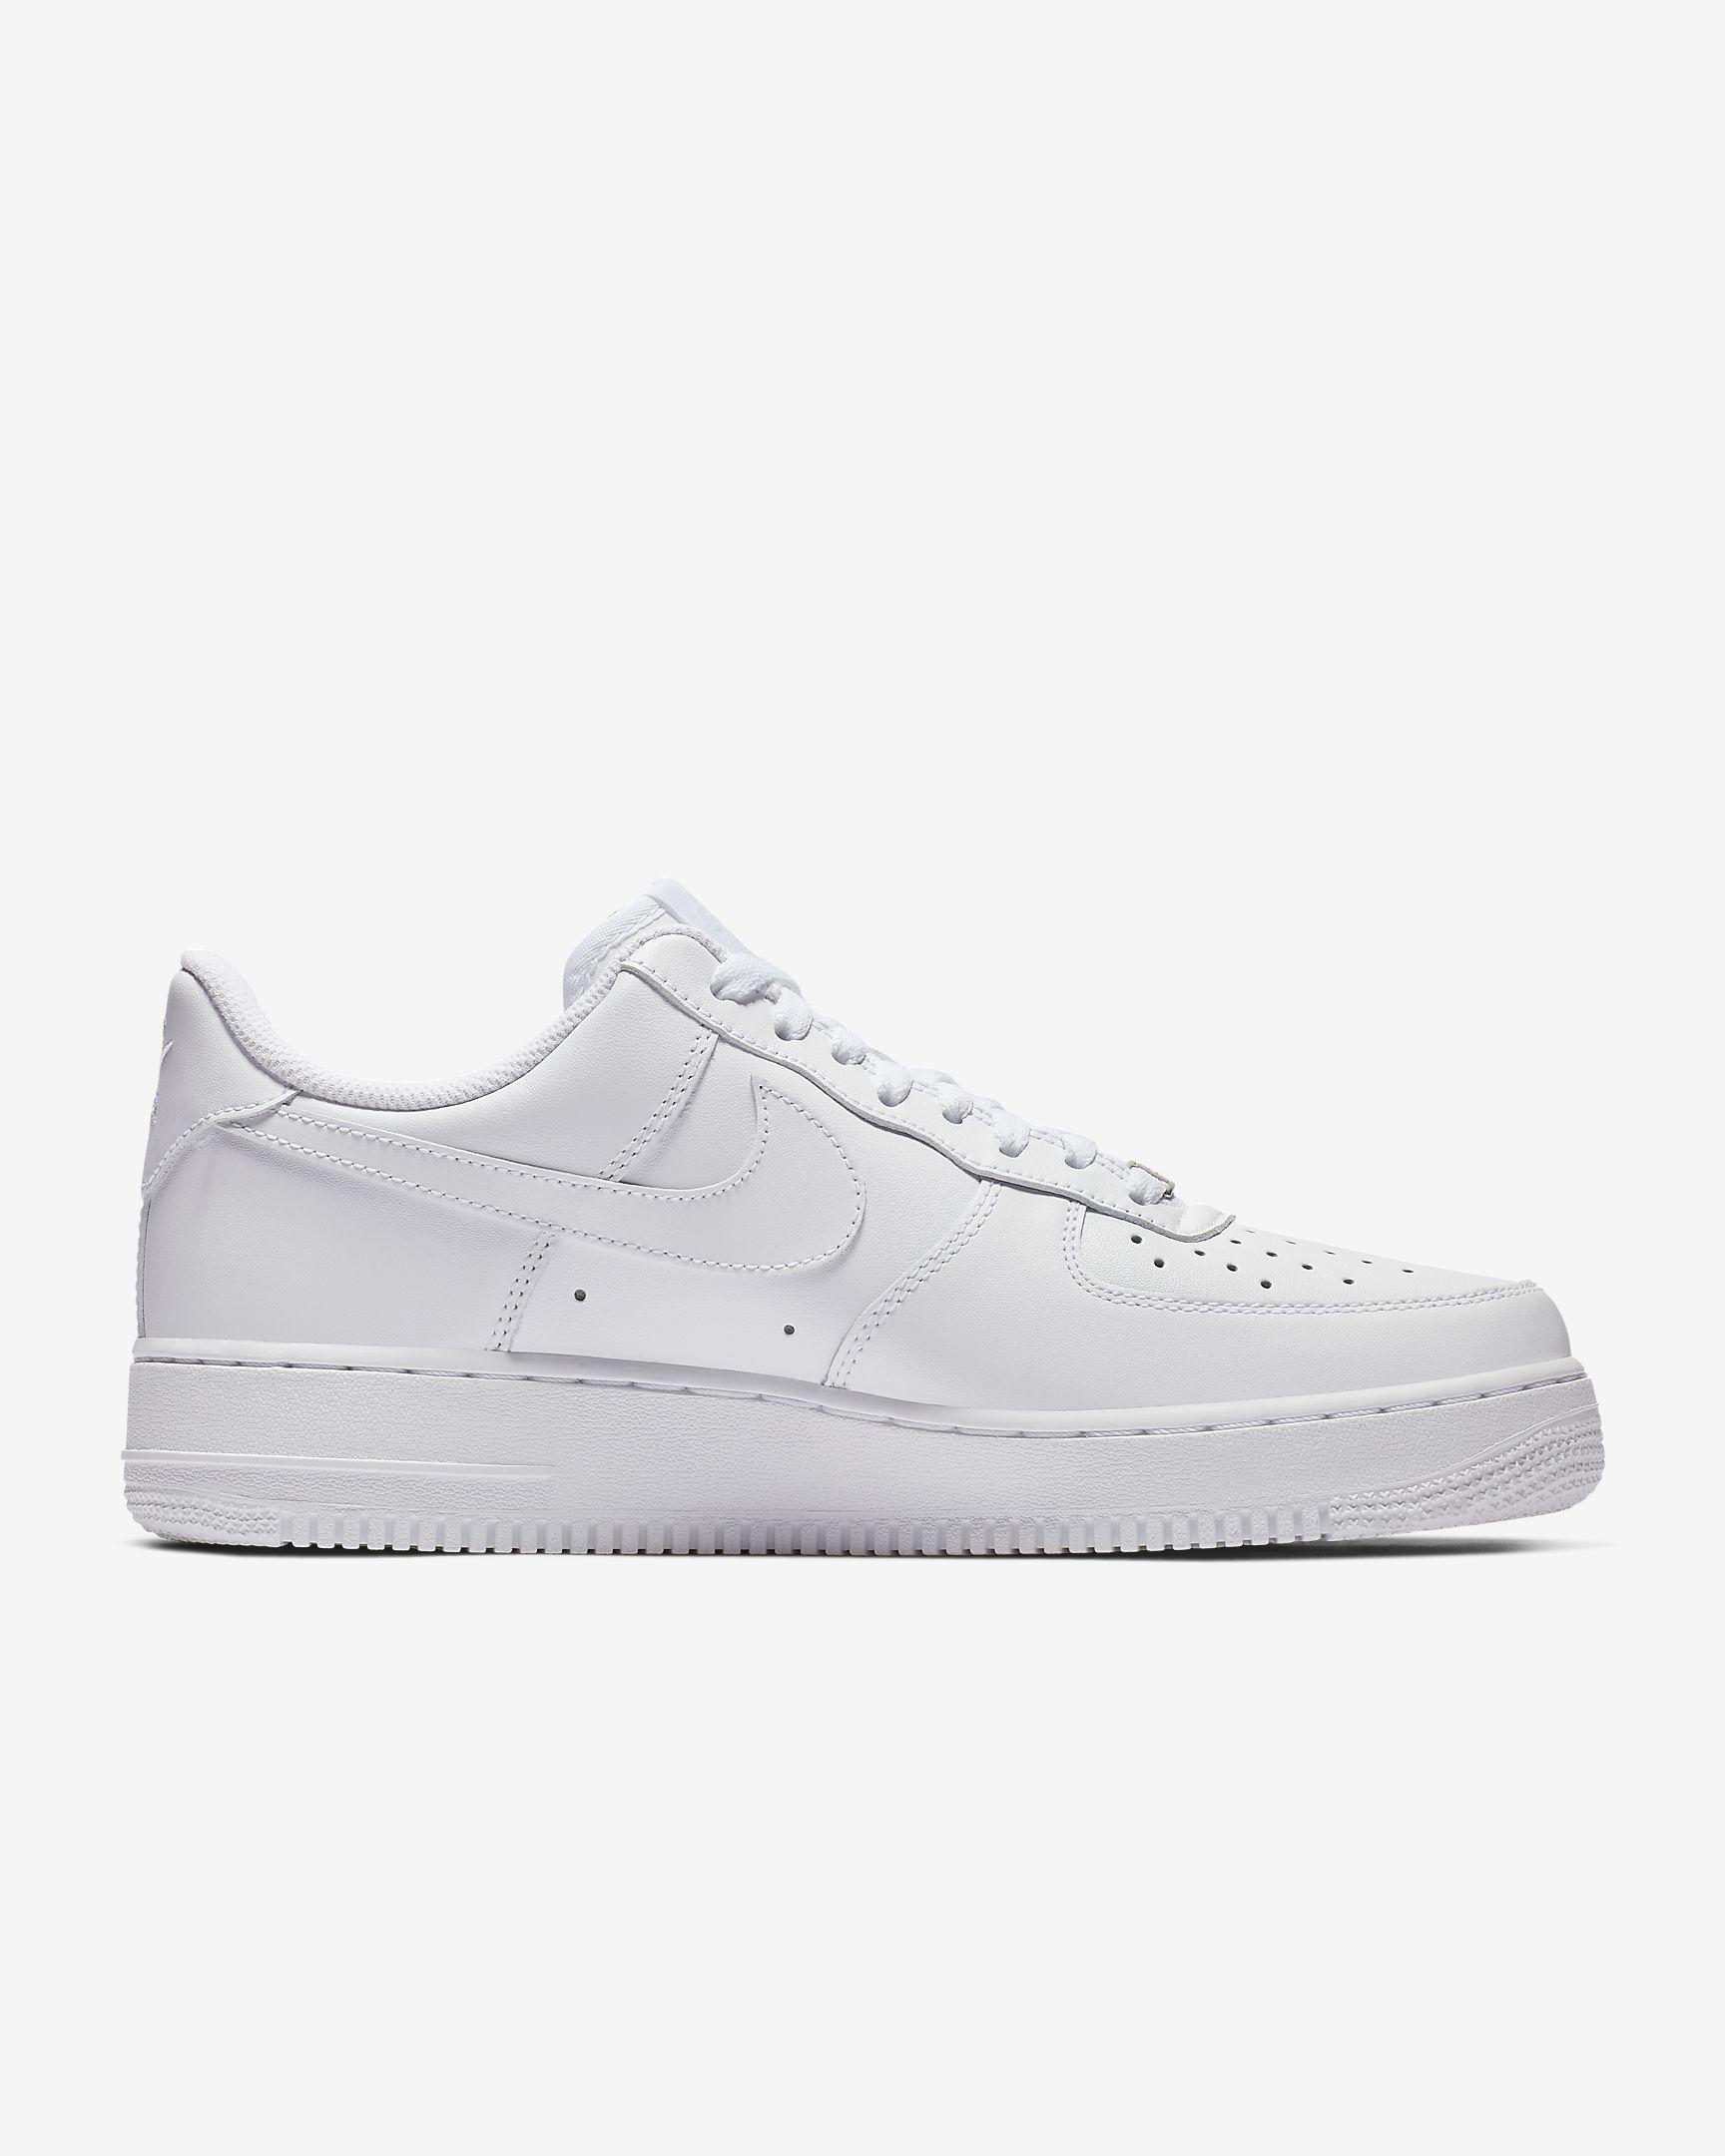 Tenisky Nike Air Force 1 Low Biele-WWW.AIRFORCE.SK